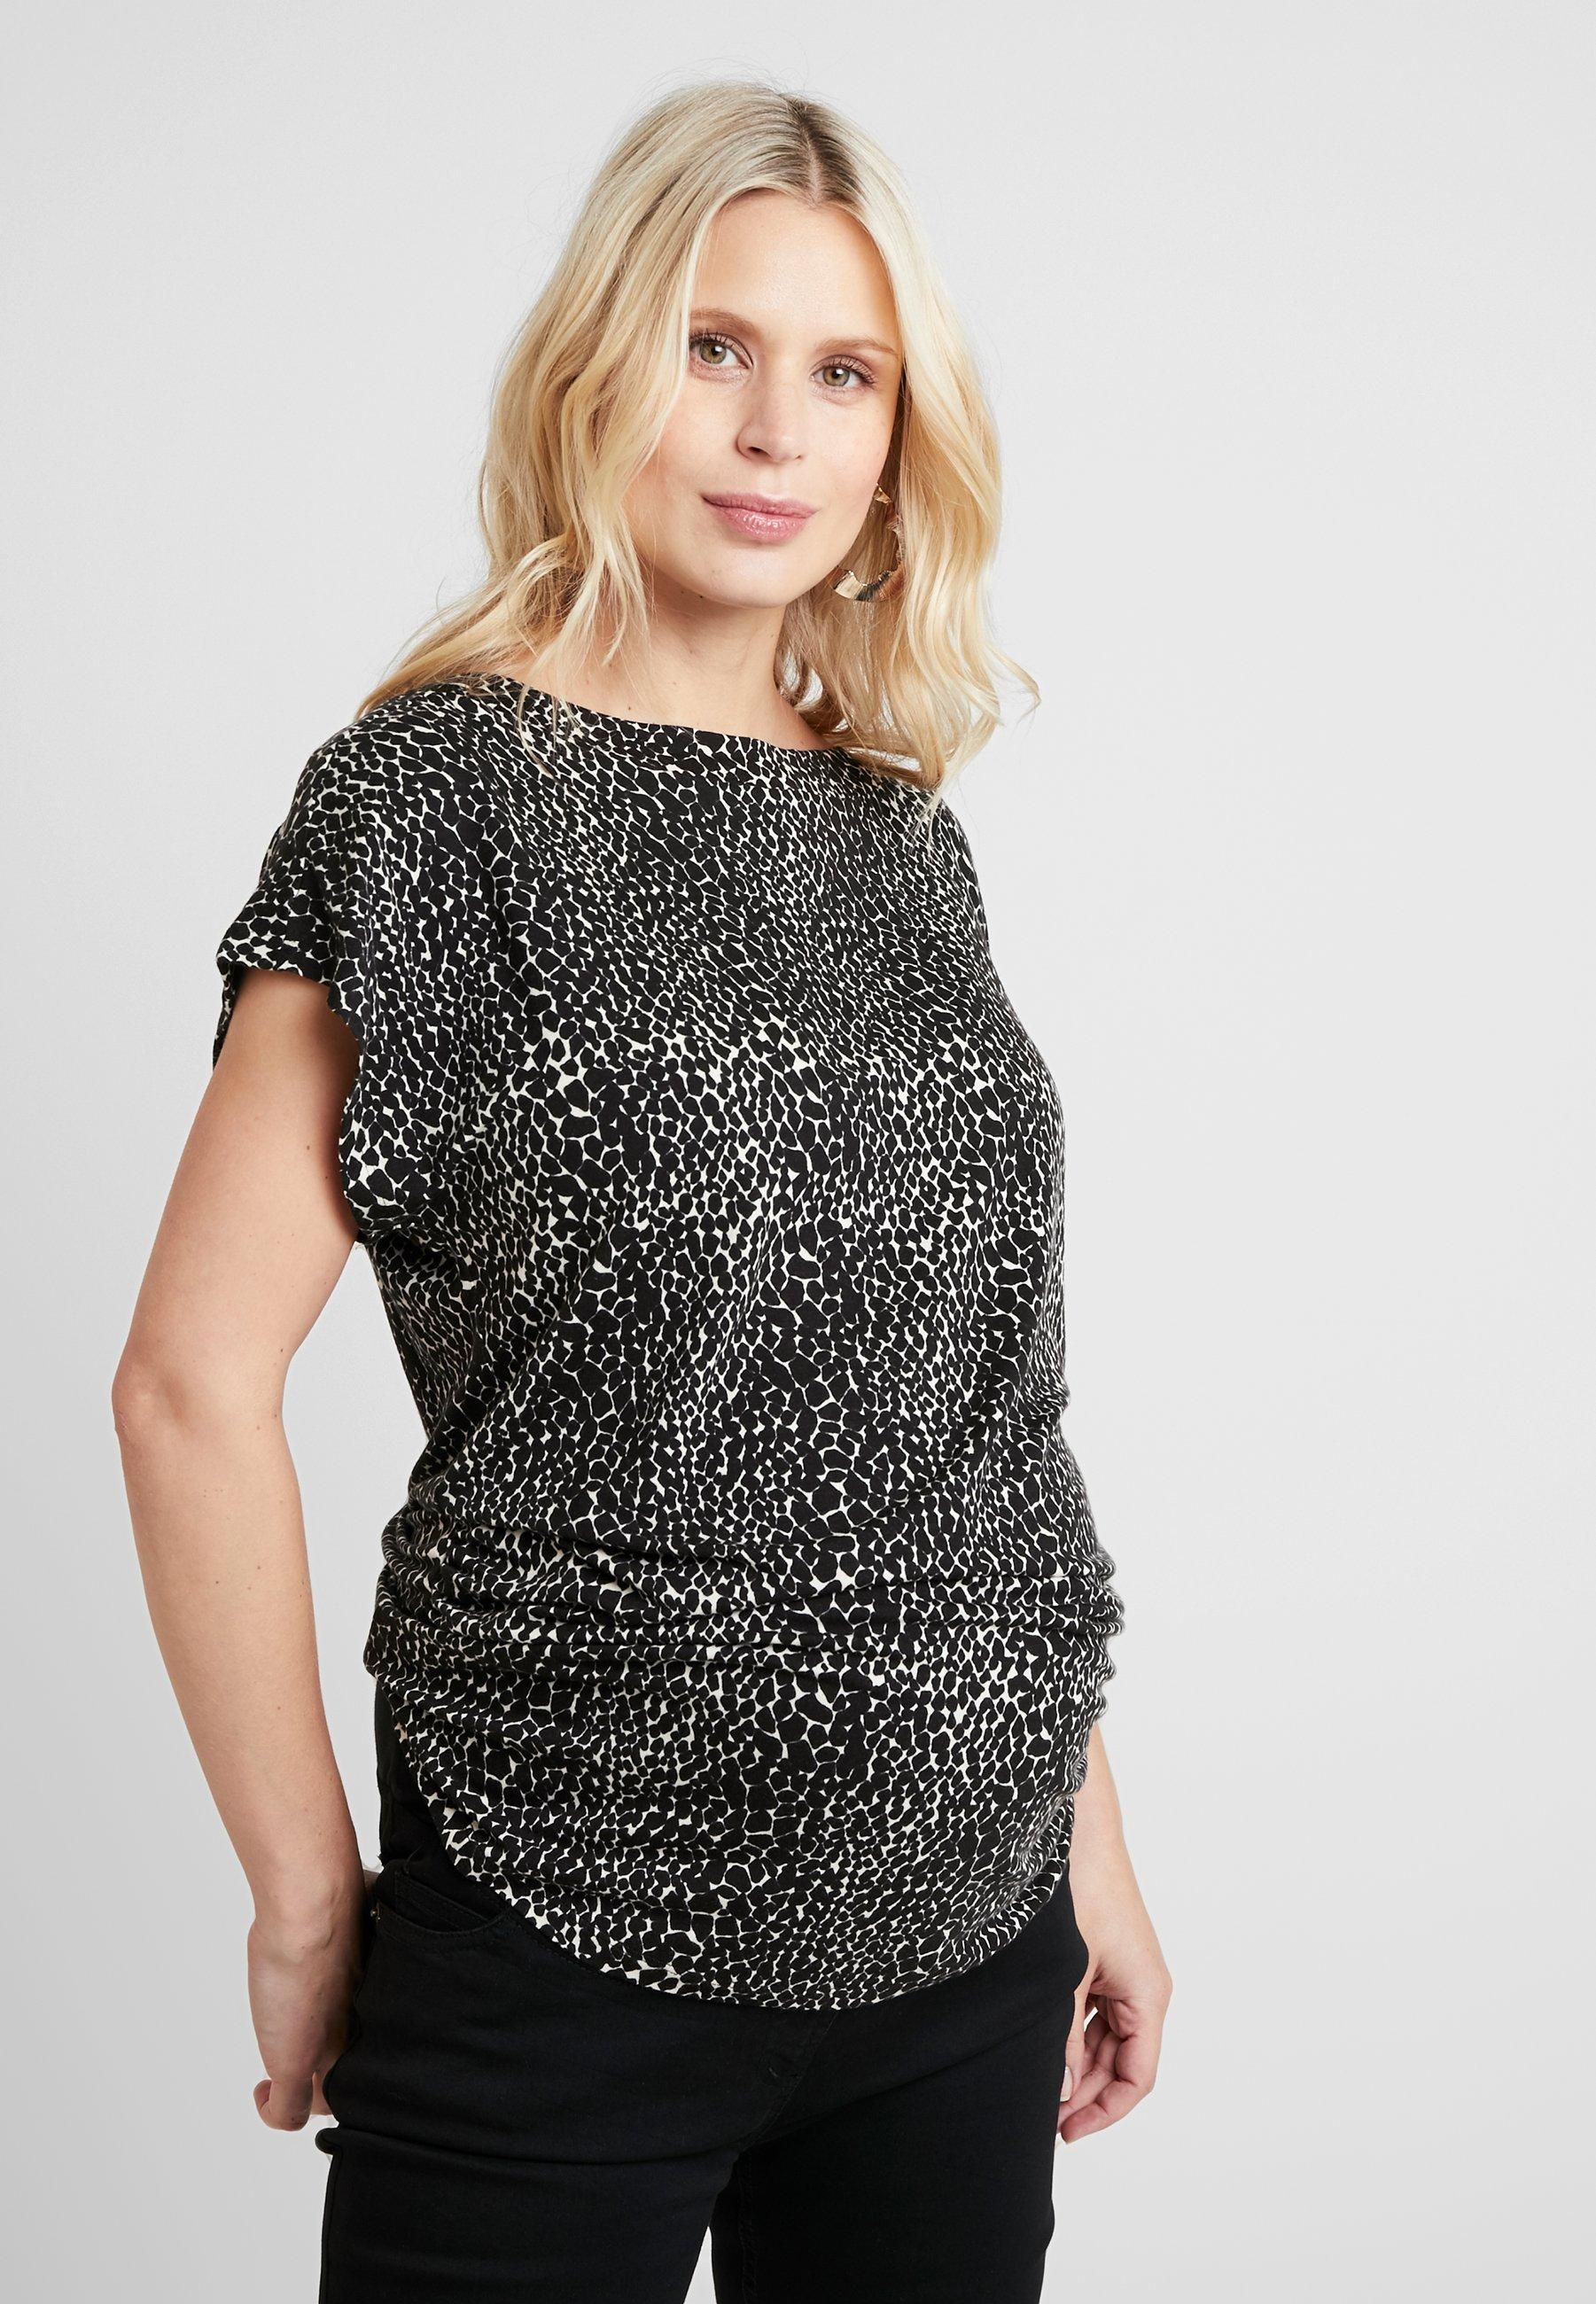 Maternity Button Dorothy Shoulder Neck Black Perkins shirt Boat TeeT Imprimé n0PwOk